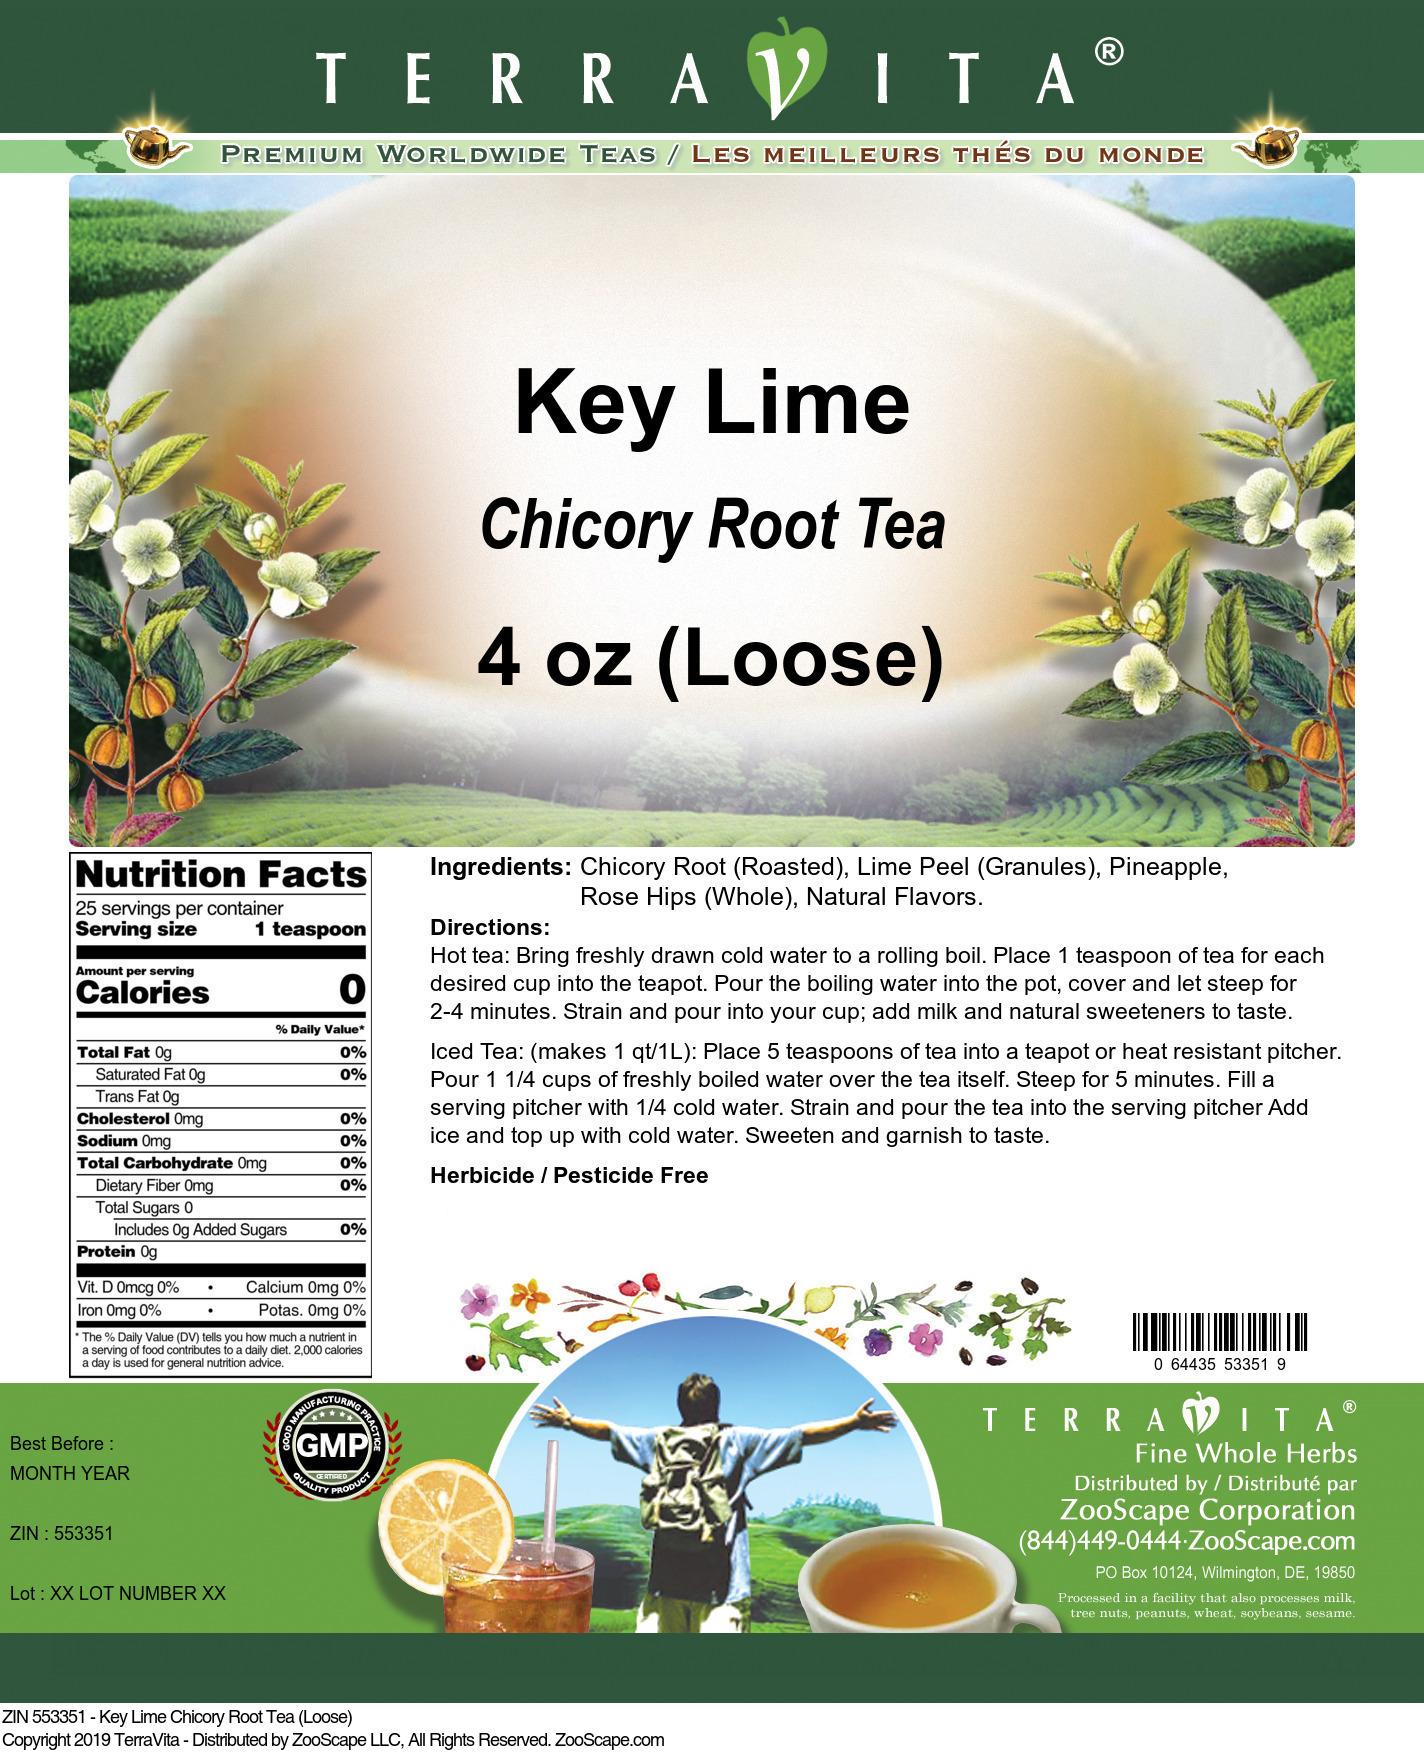 Key Lime Chicory Root Tea (Loose)